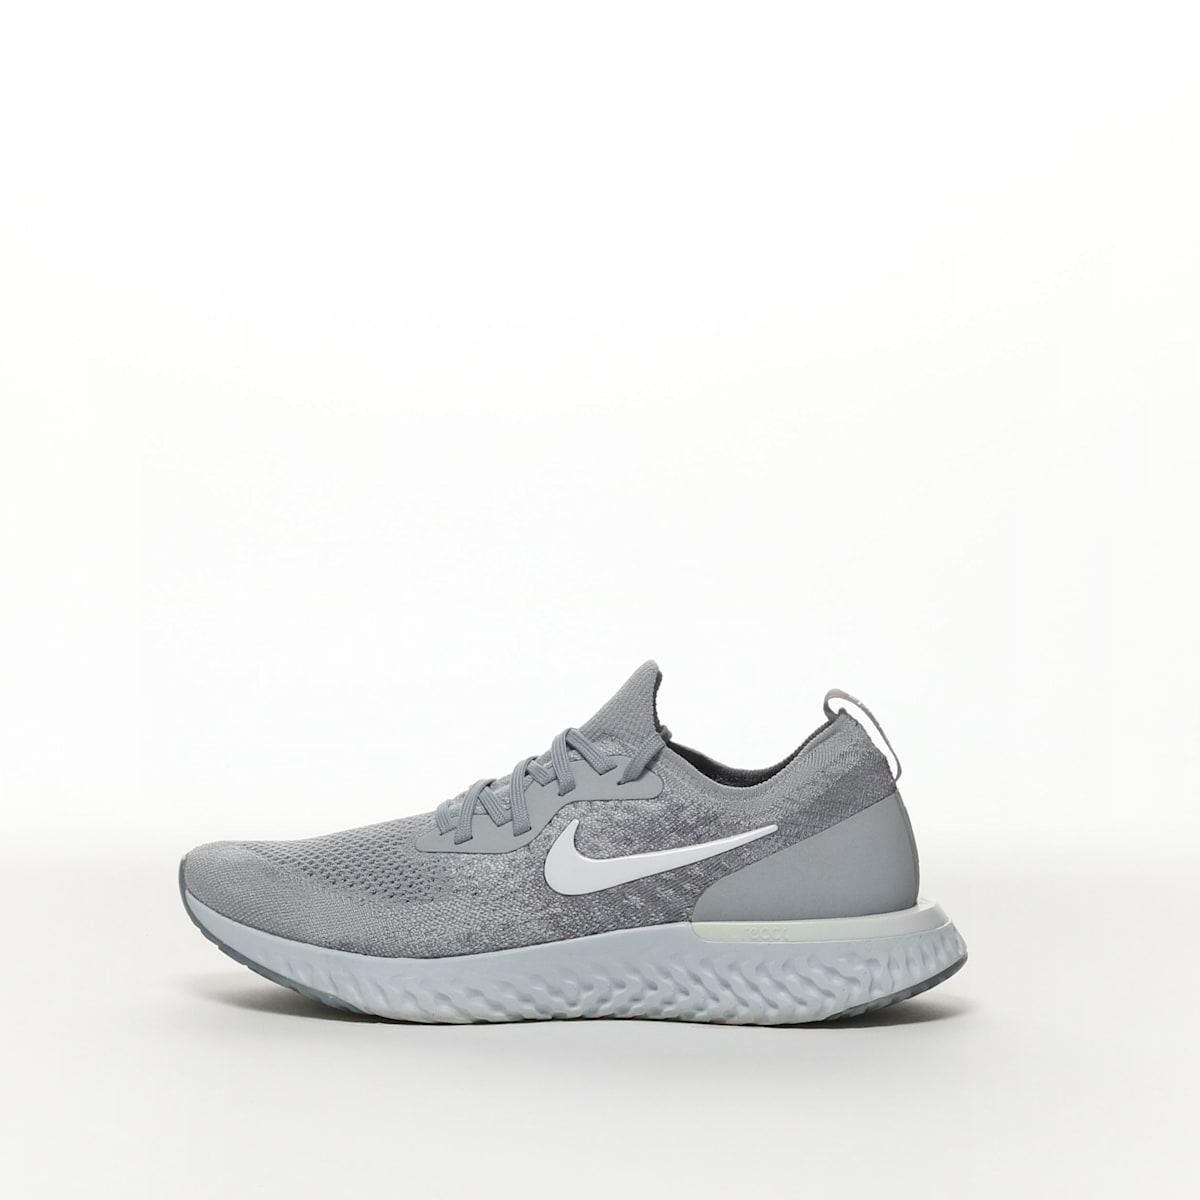 330b43305529b Nike Epic React Flyknit - WOLF GREY COOL GREY PURE PLATINUM WHITE – Resku